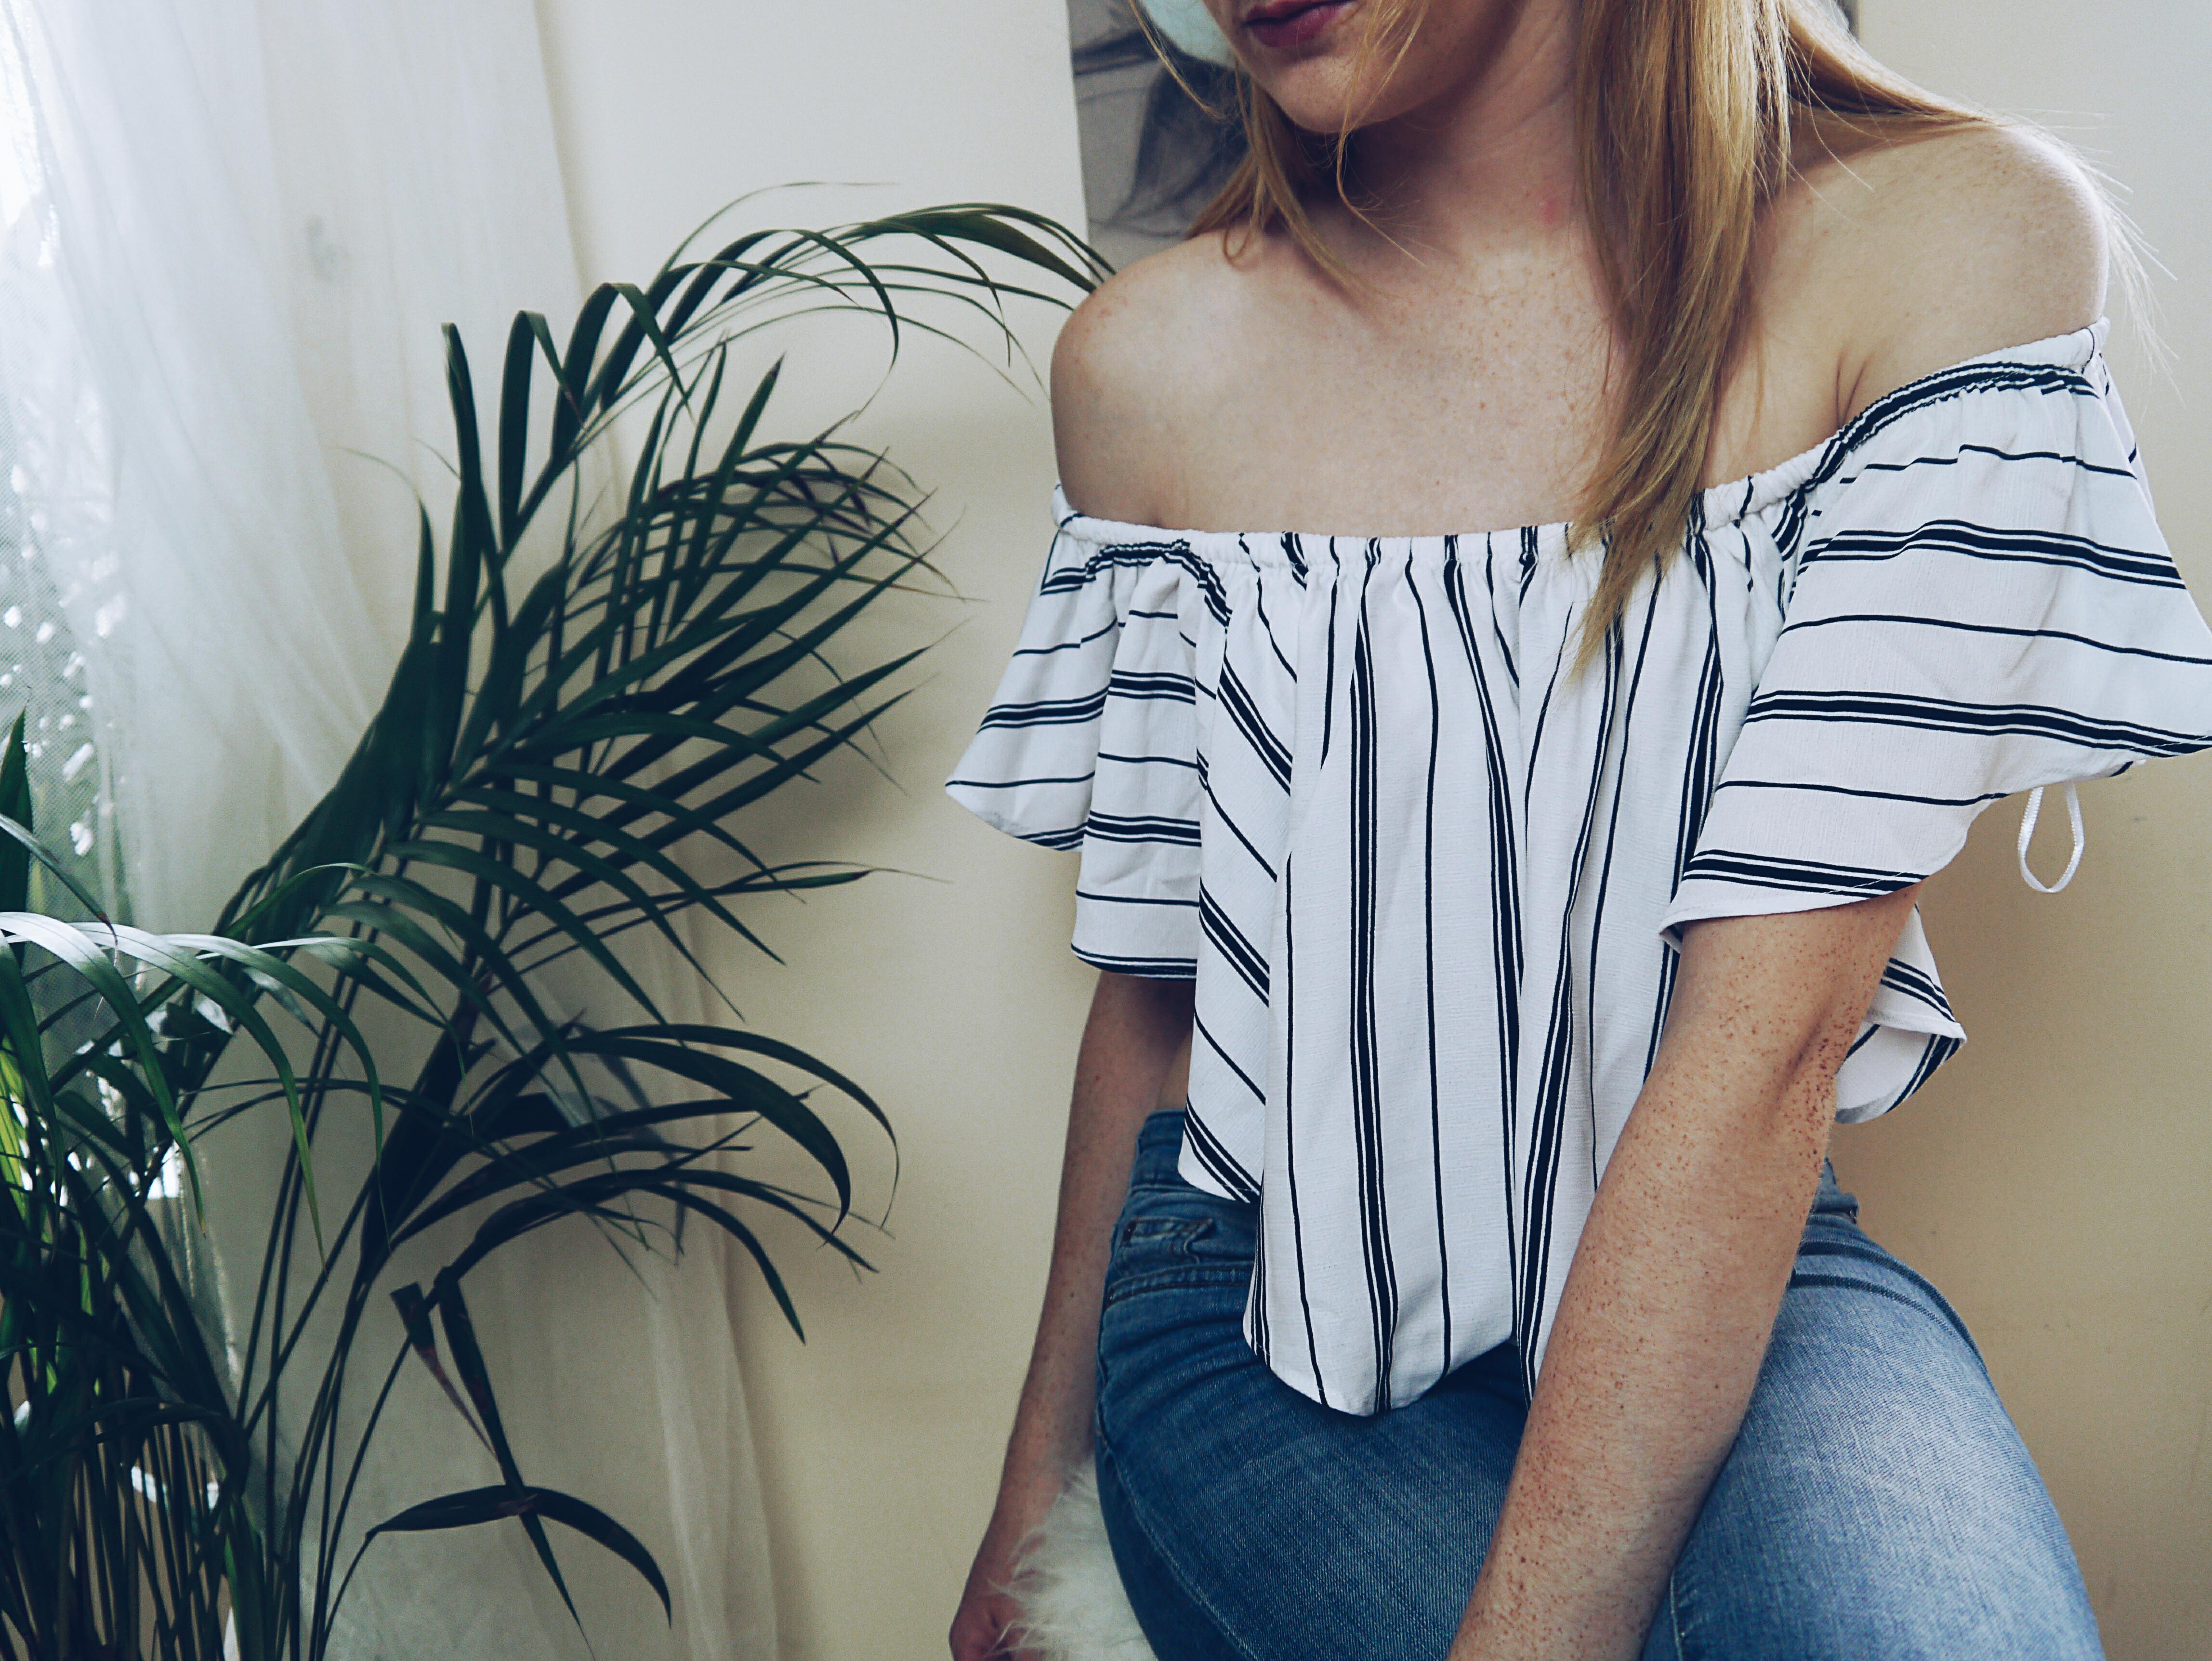 asos-top-haul-cropped-off-the-shoulder-stripes